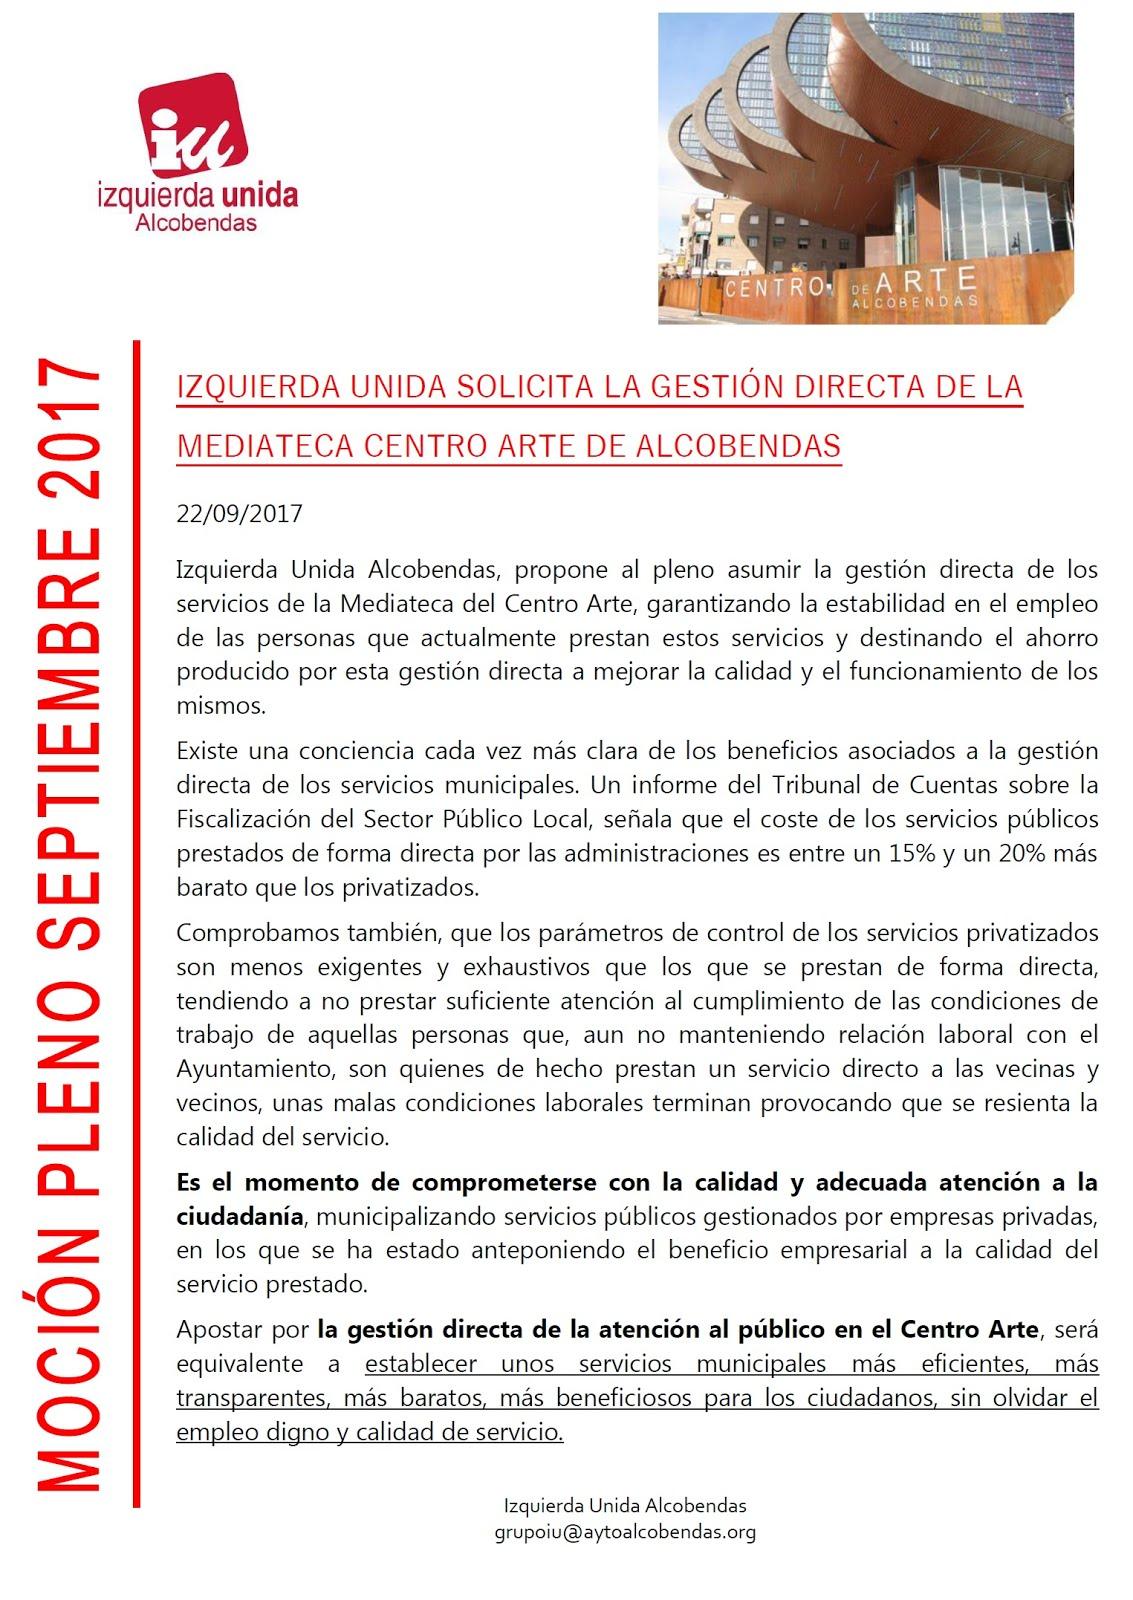 Gestión directa Mediateca Centro Arte